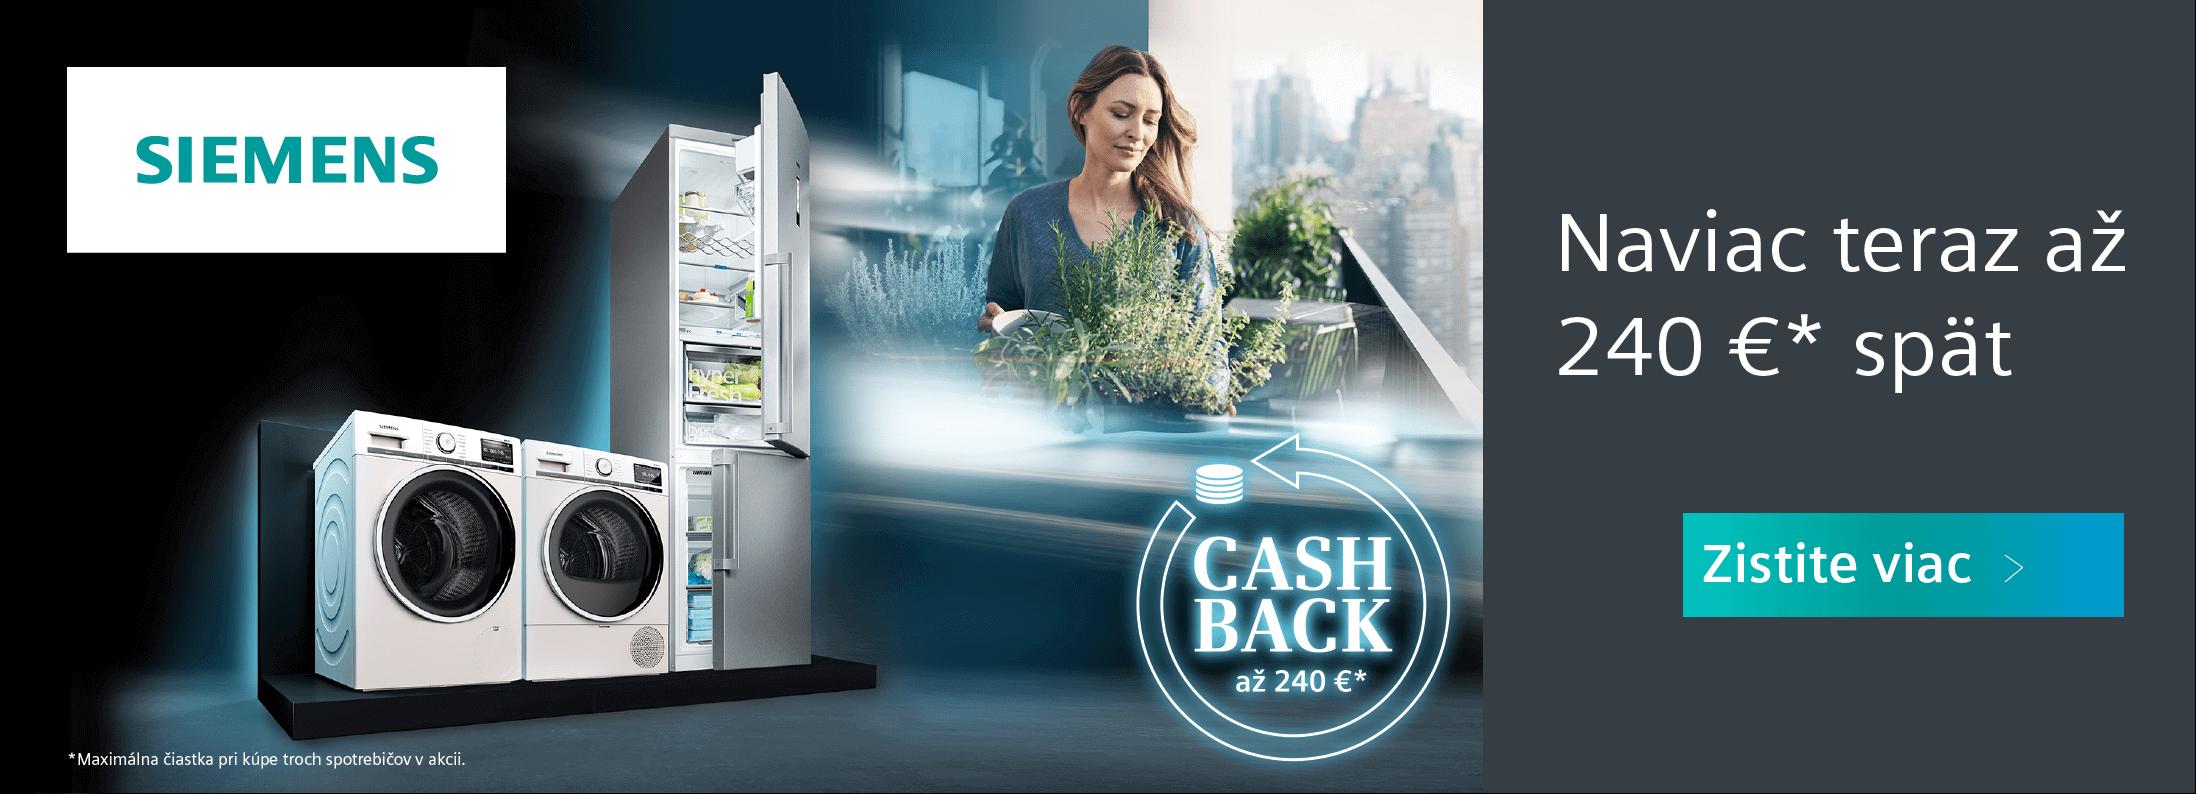 Siemens - Cashback v hodnote až 240 EUR